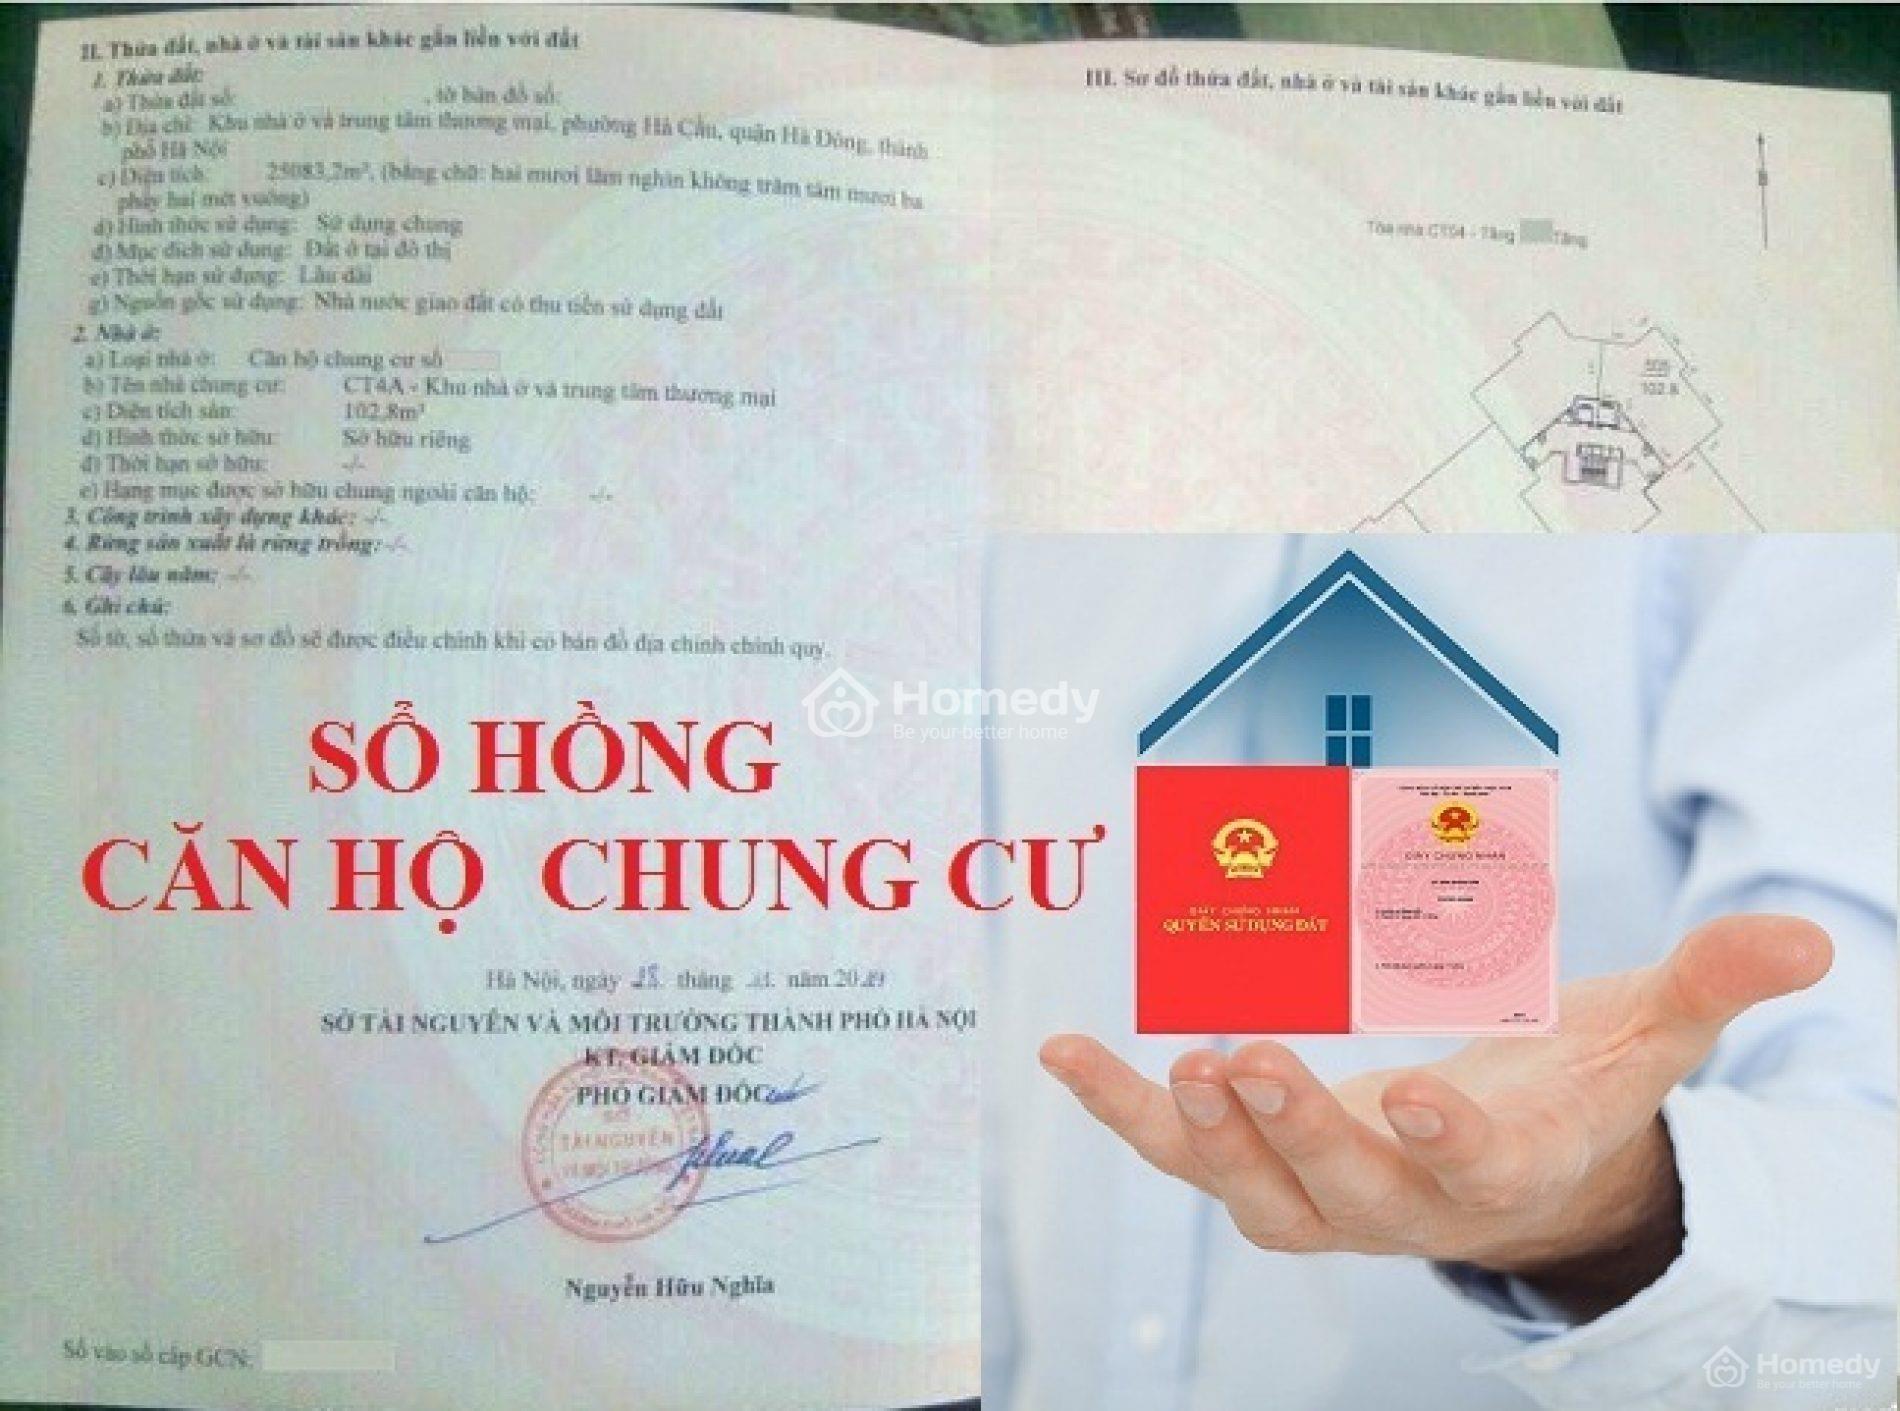 ao hong chung cu